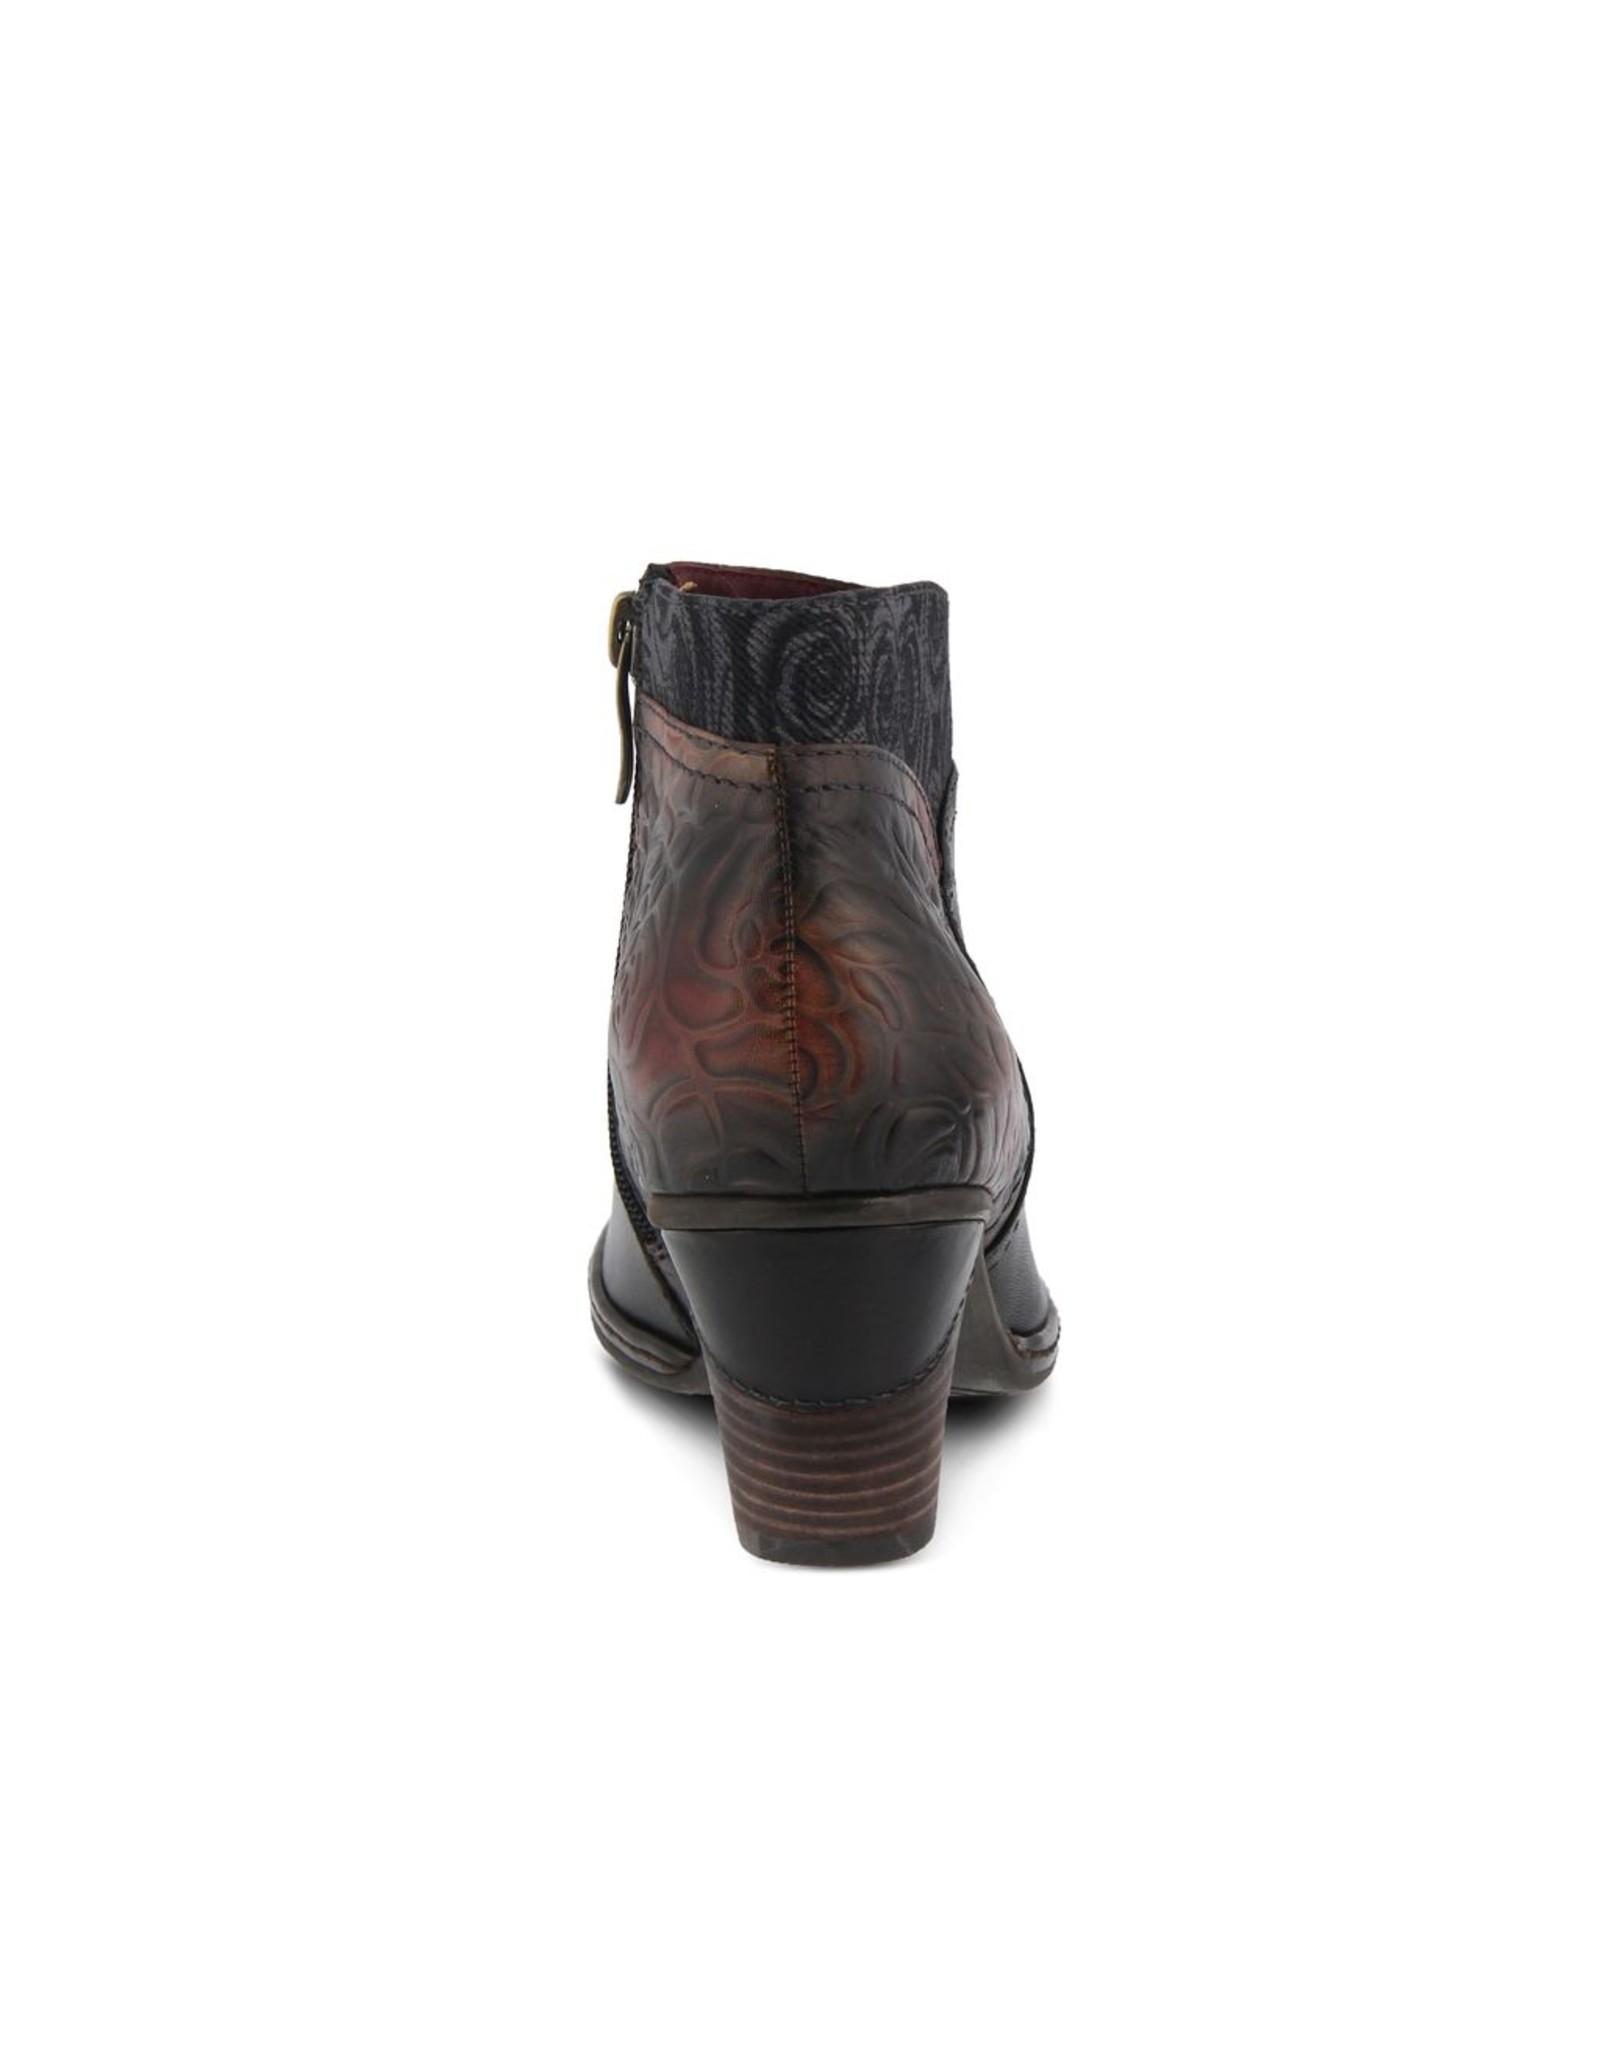 Esben Leather Bootie